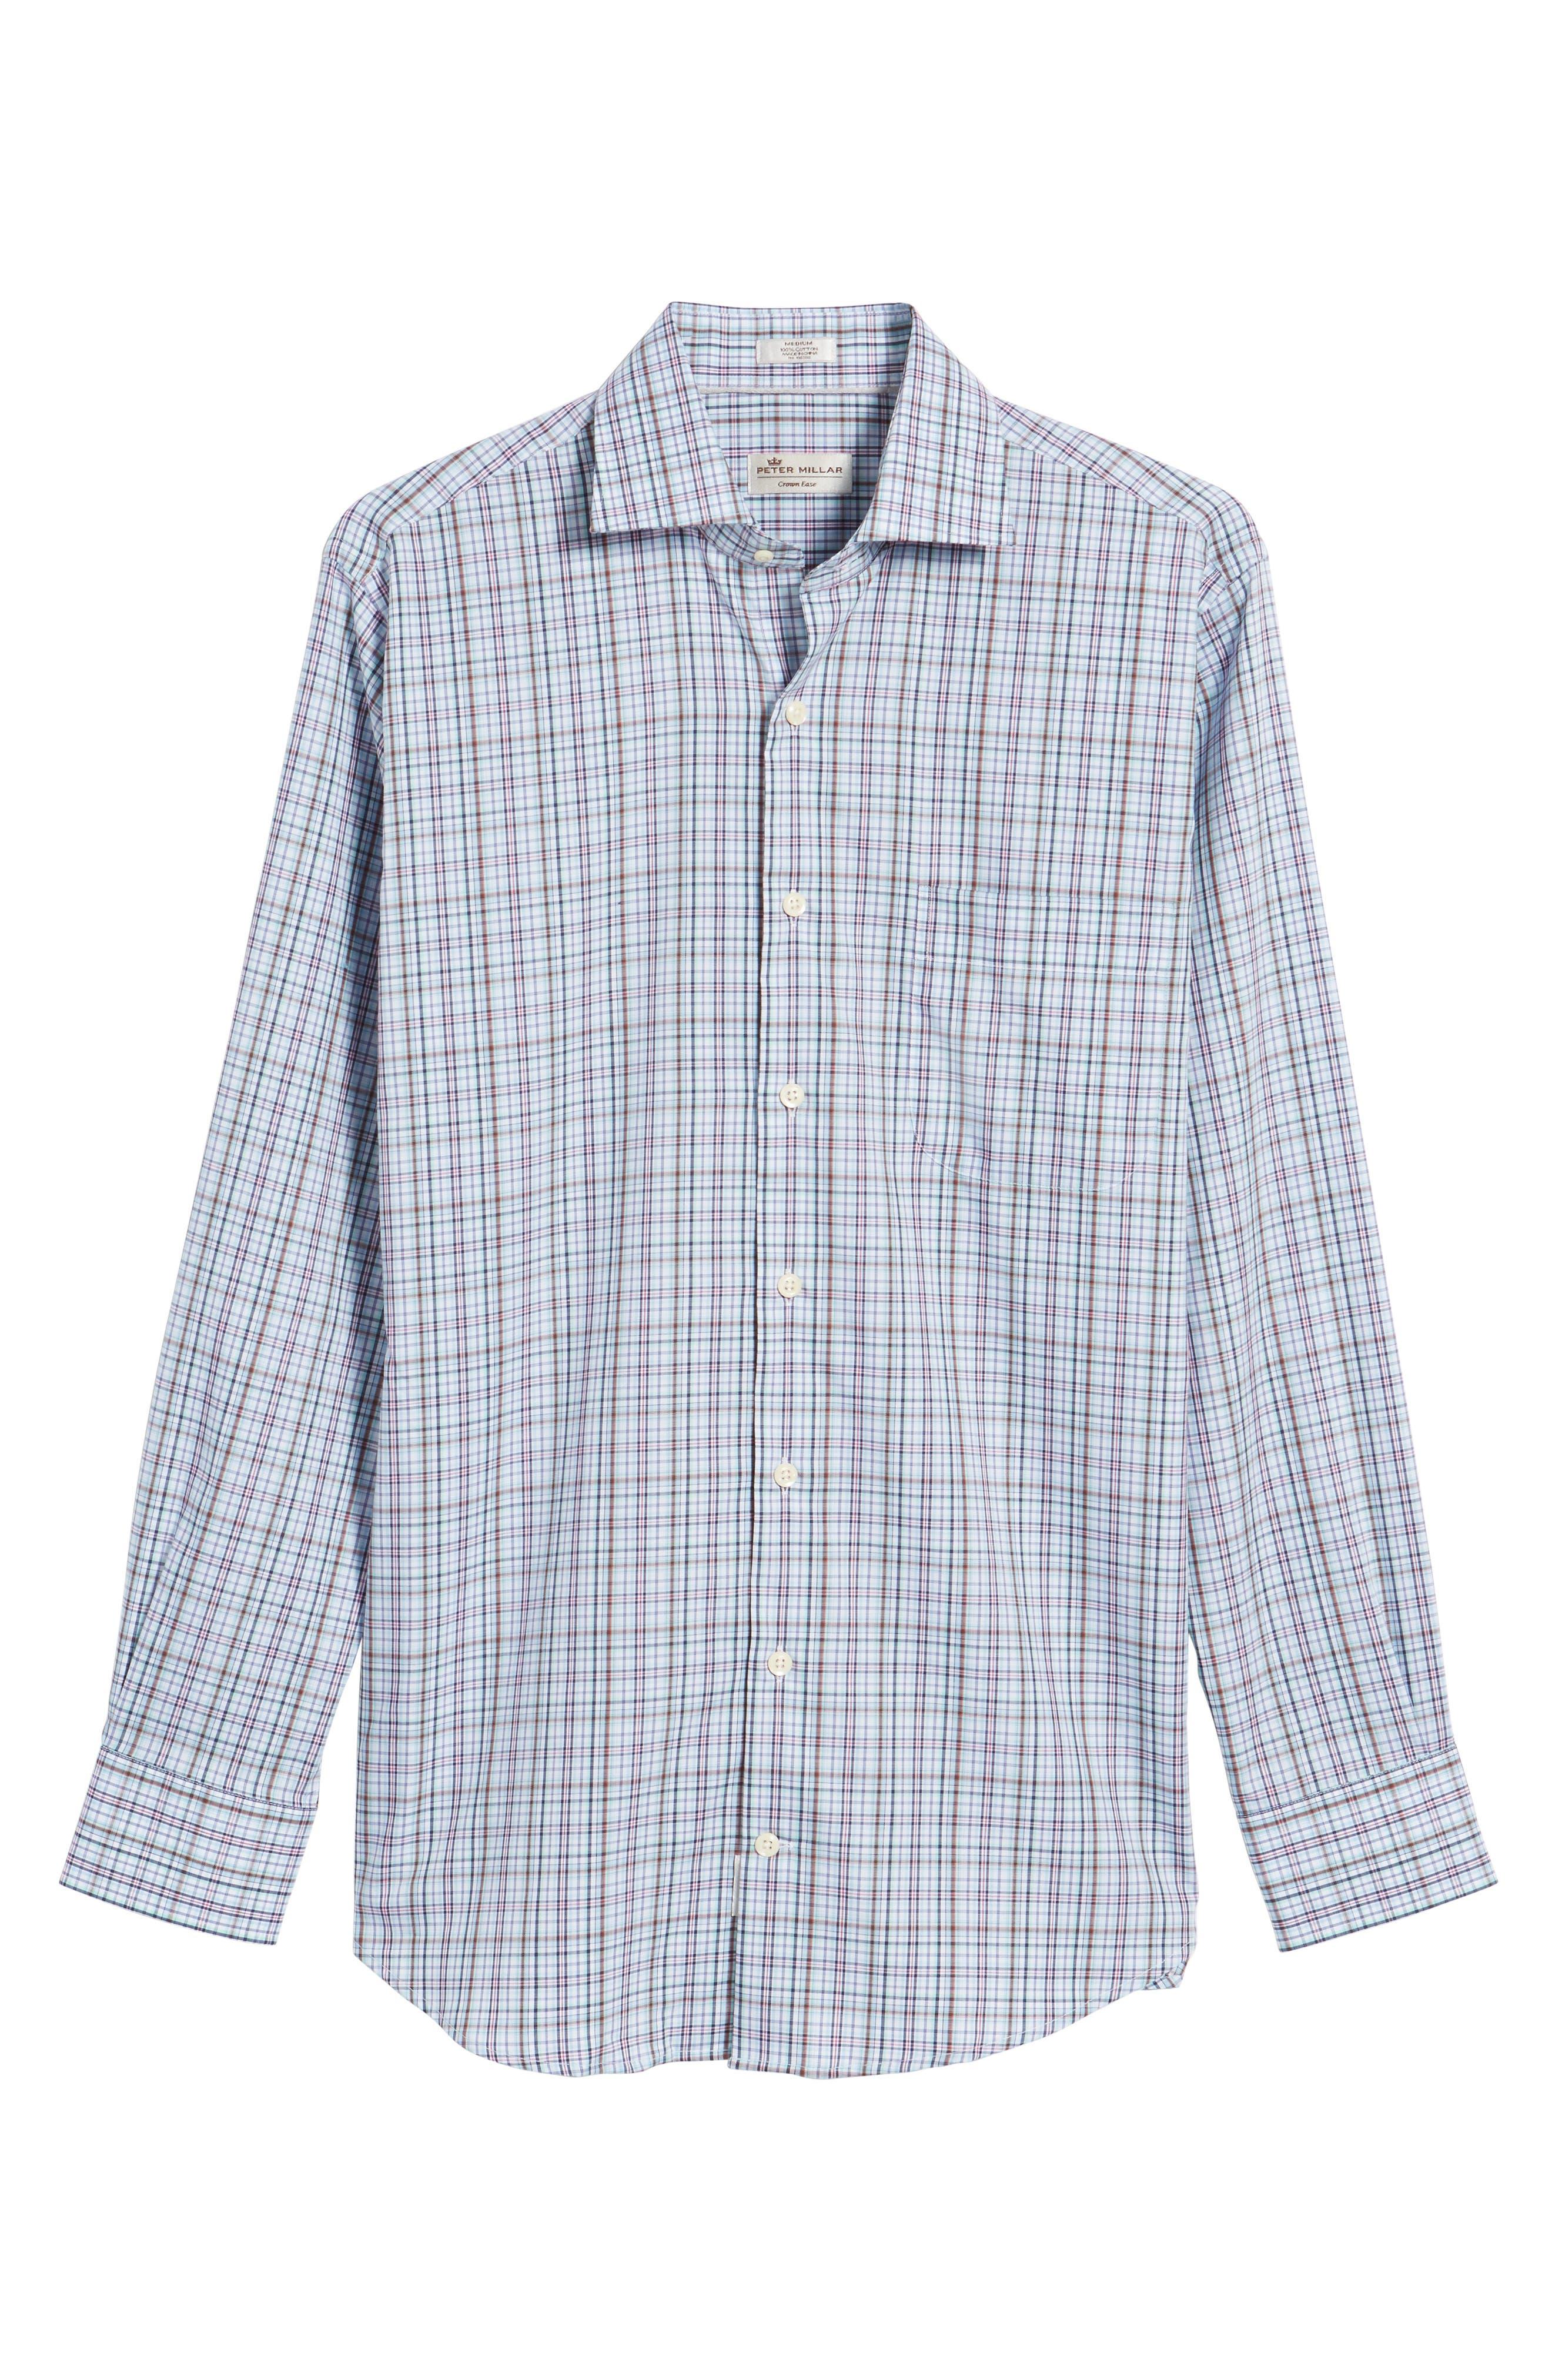 Crown Ease Tango Pinwheel Regular Fit Sport Shirt,                             Alternate thumbnail 6, color,                             453